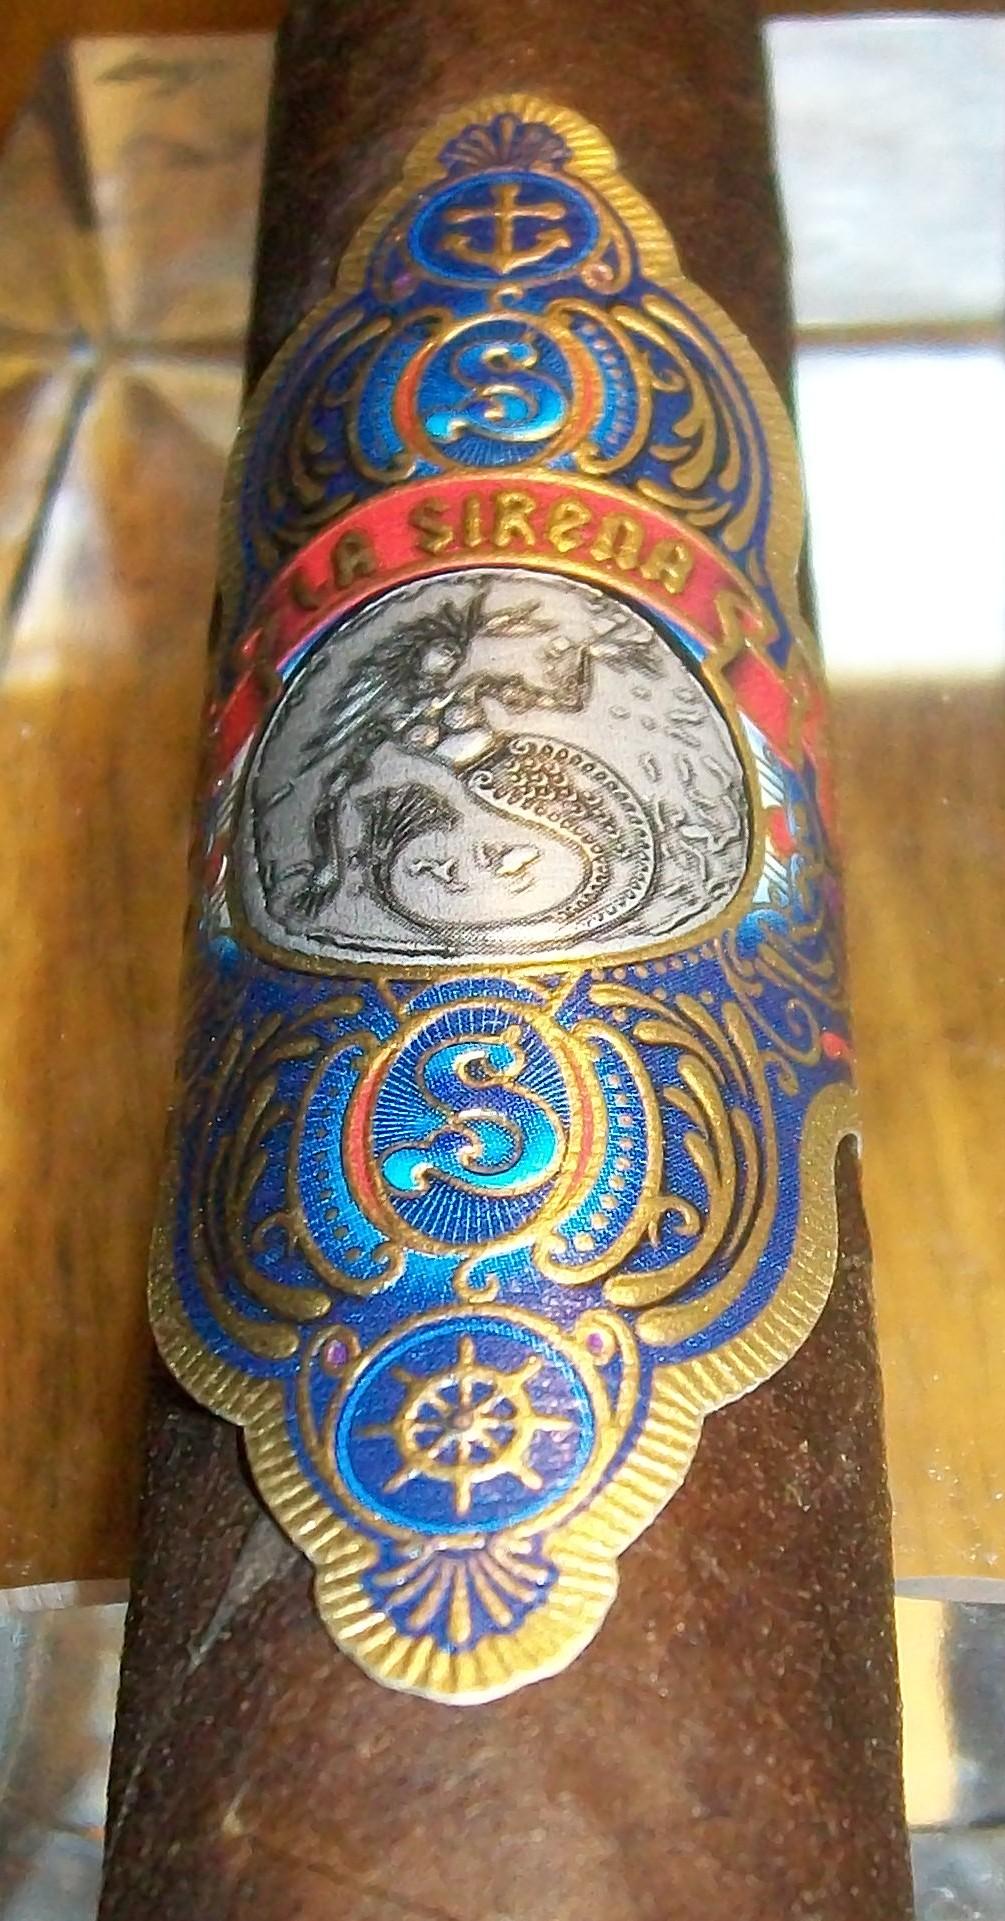 Cigar Review: La Sirena